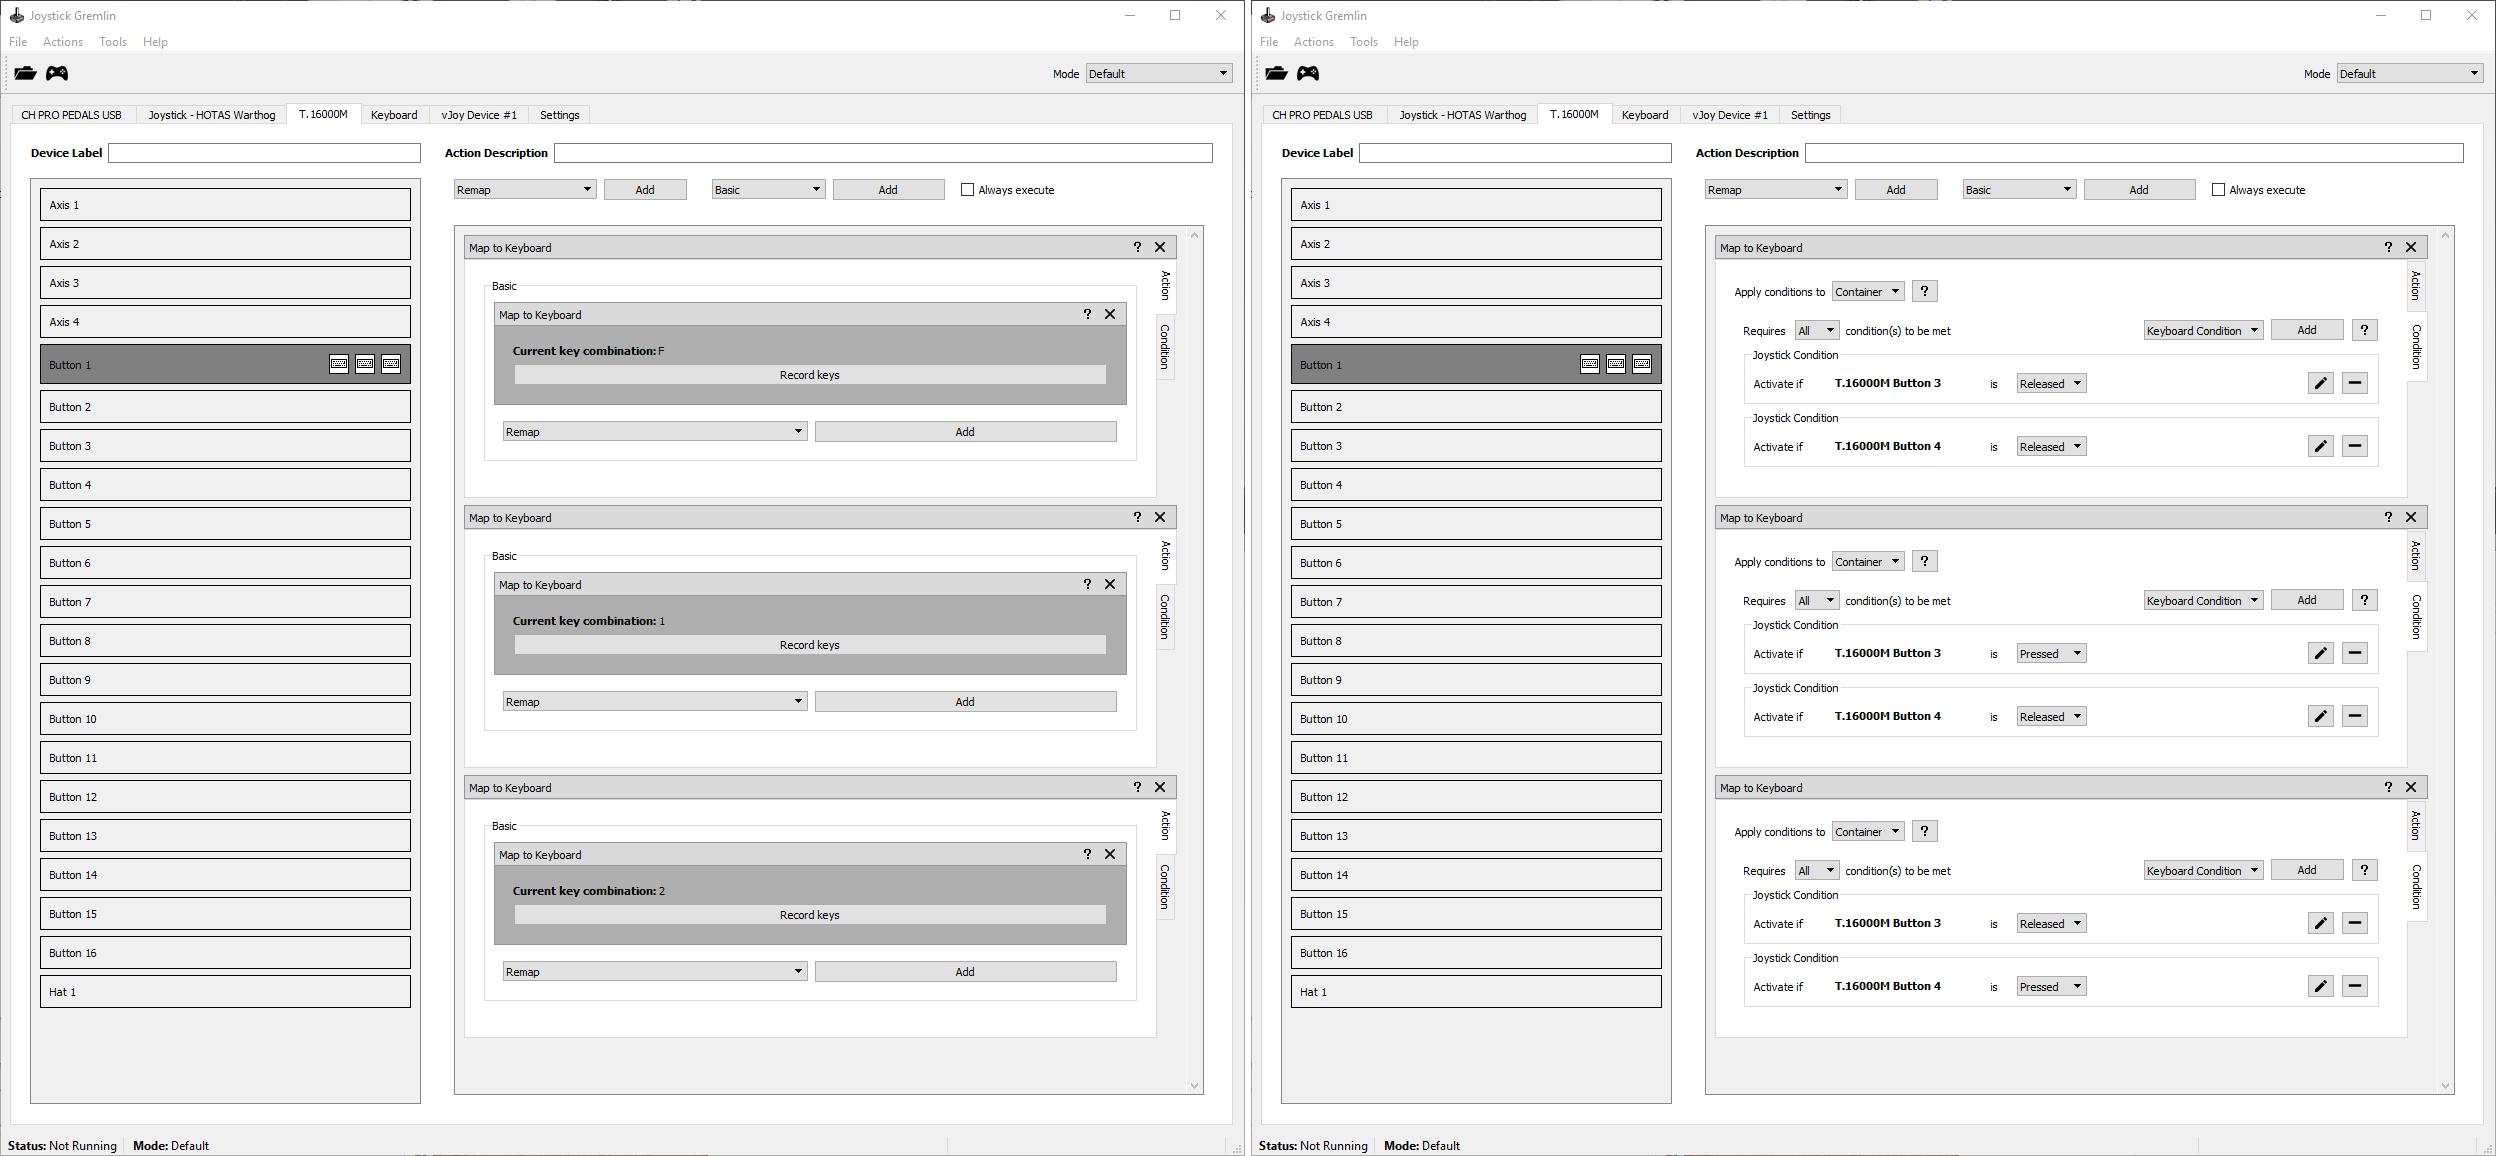 JoyToKey vs Joystick Gremlin - 3rd Party Apps, Utilities, Tools and